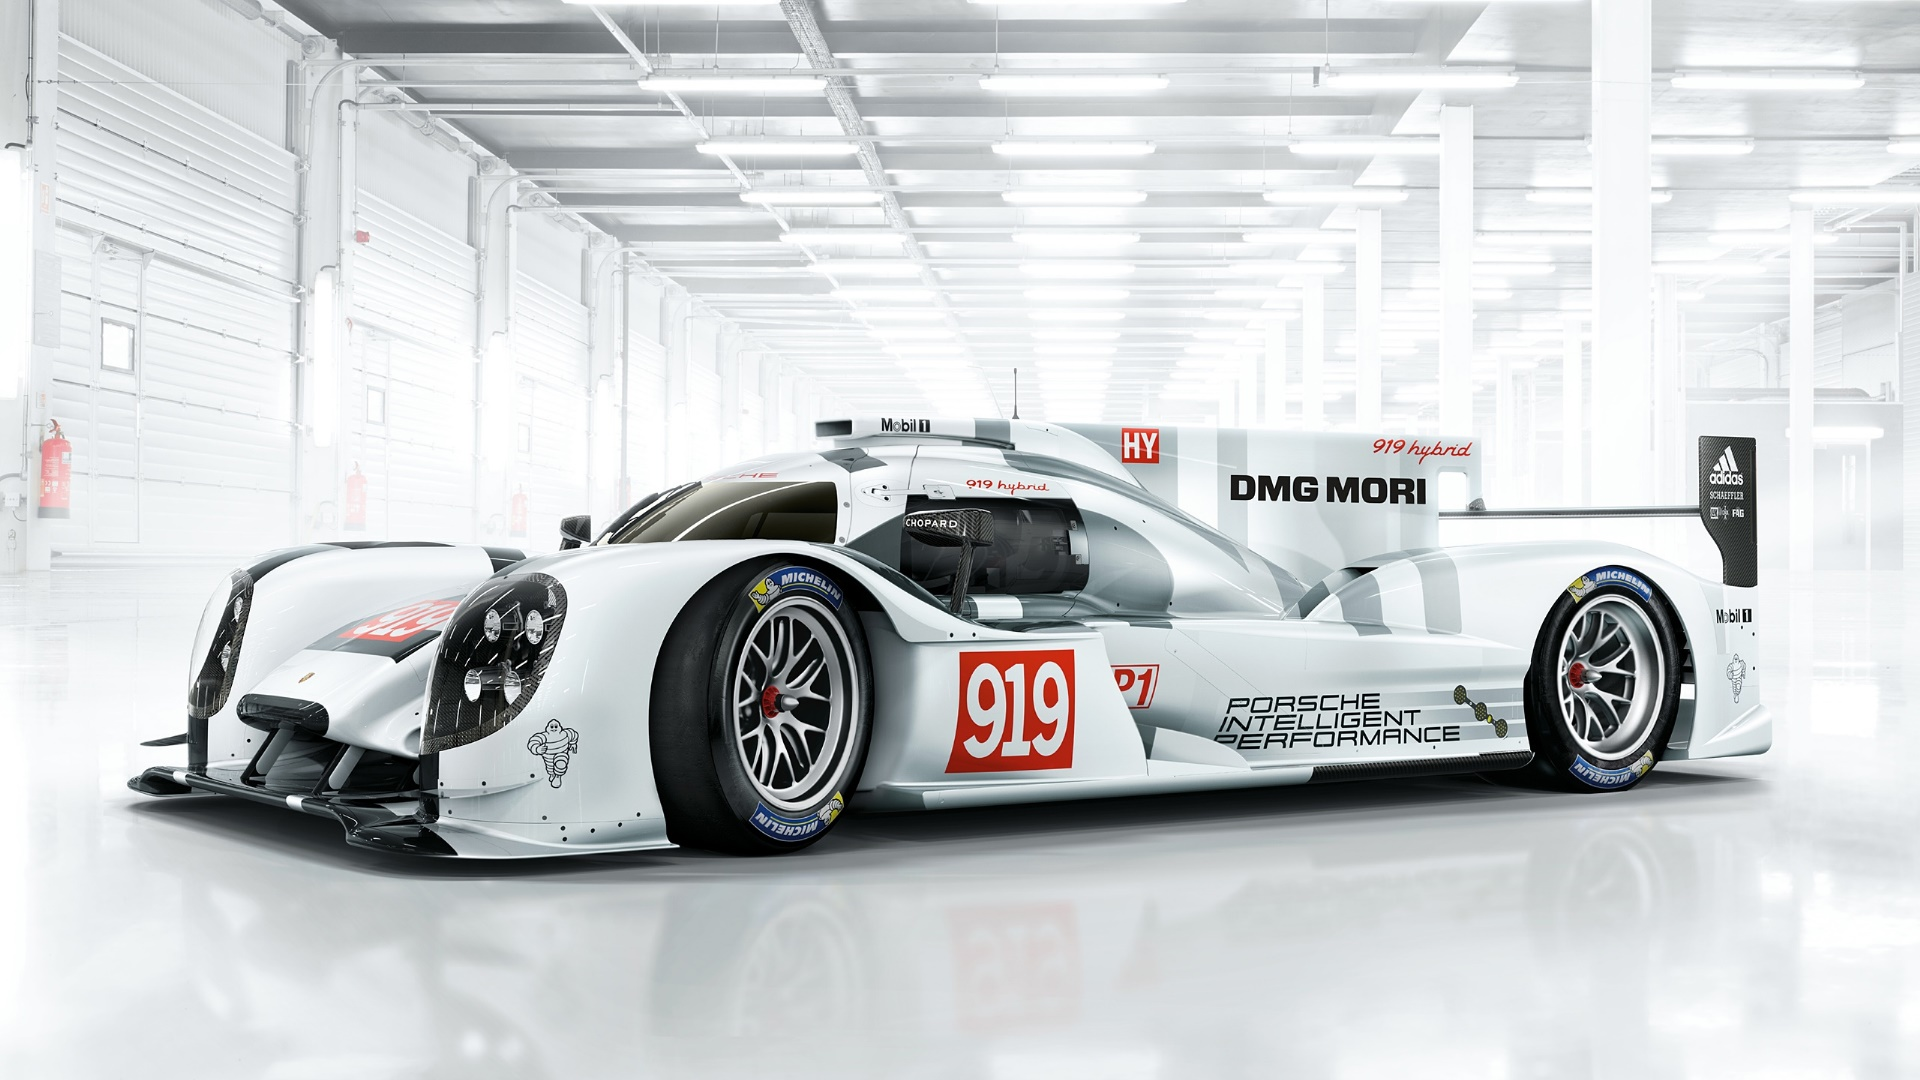 2014 Porsche 919 Hybrid wallpaper